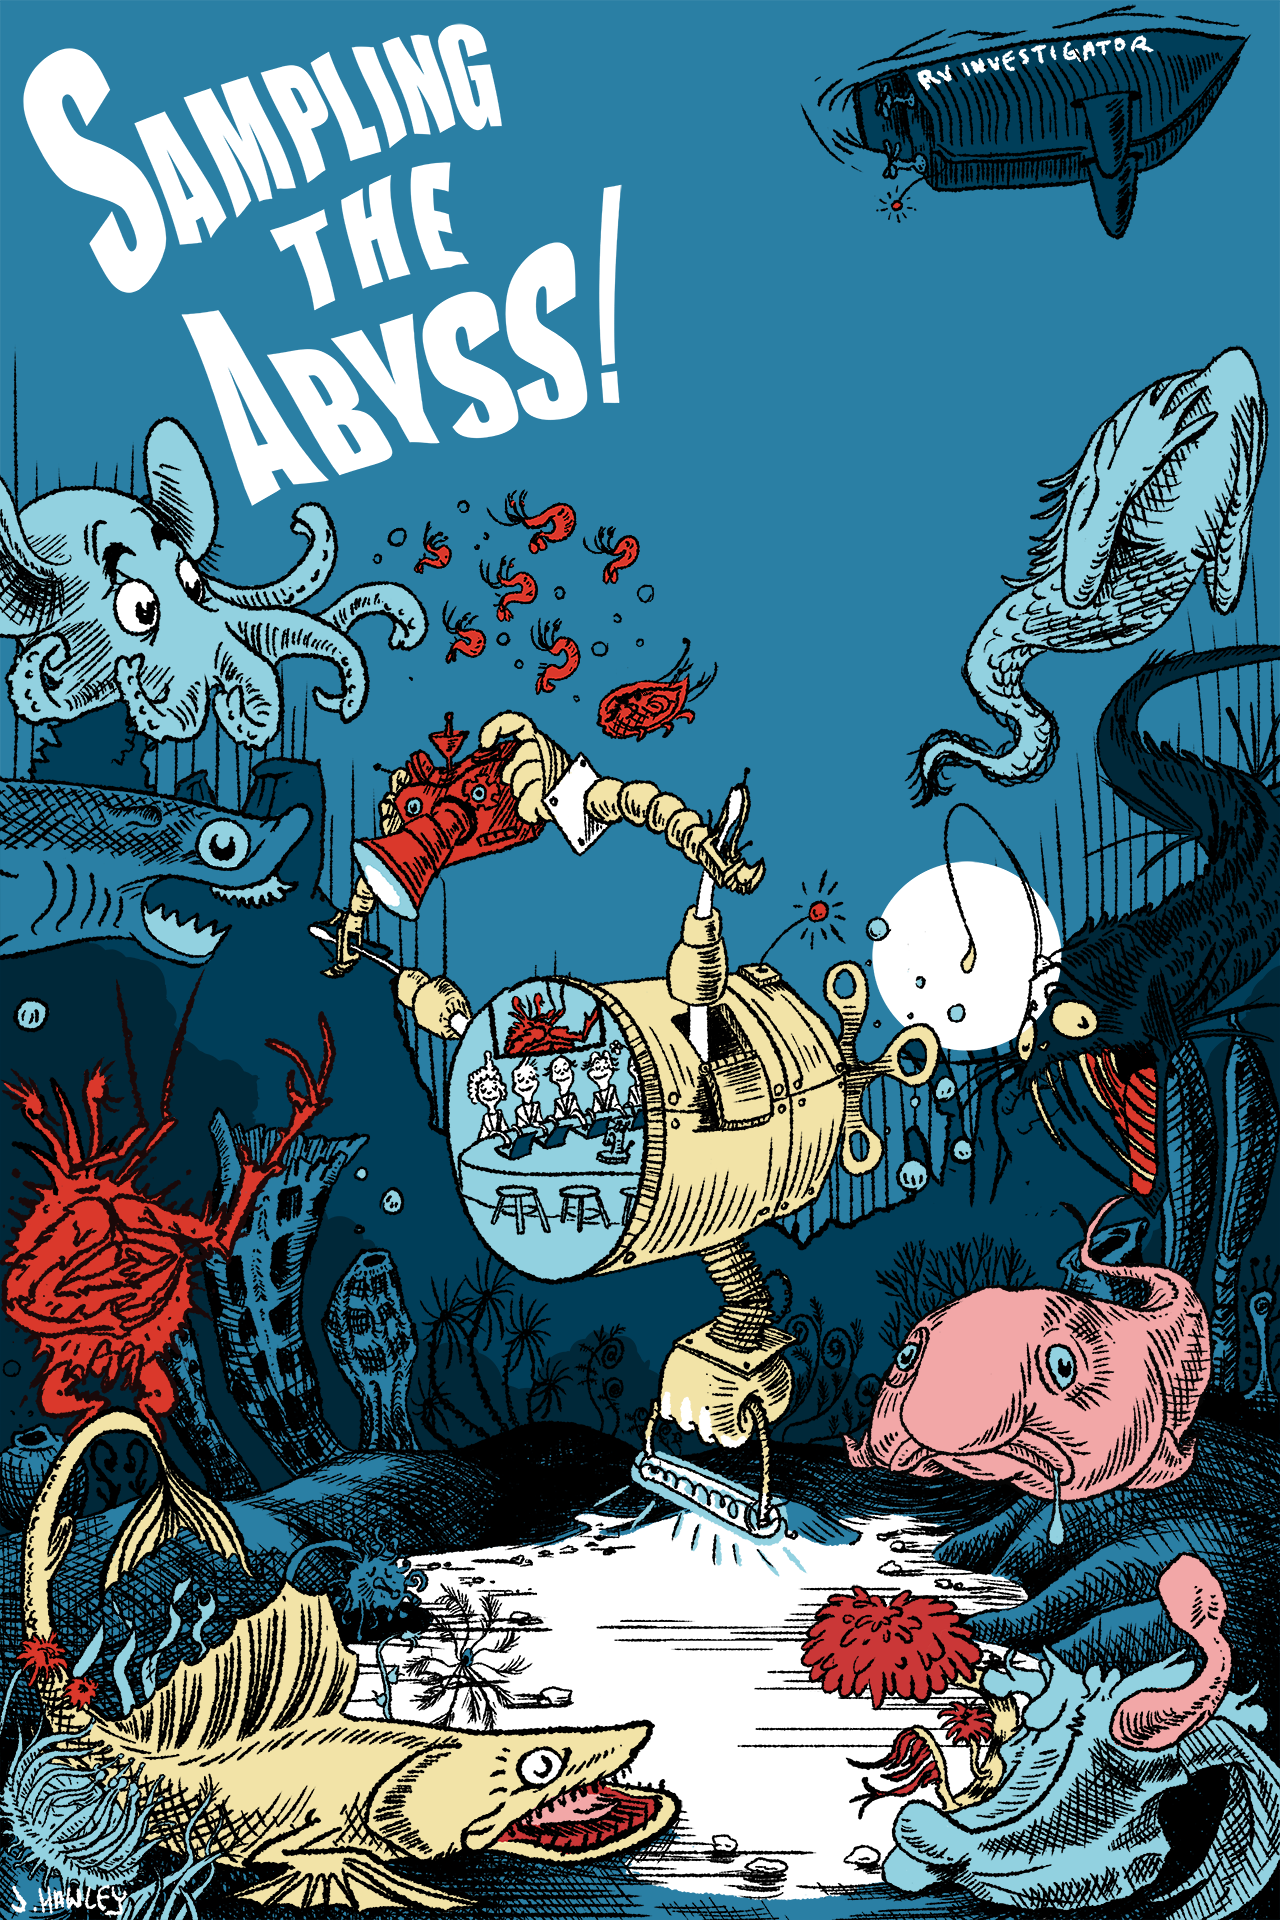 RV Investigator: Sampling the Abyss